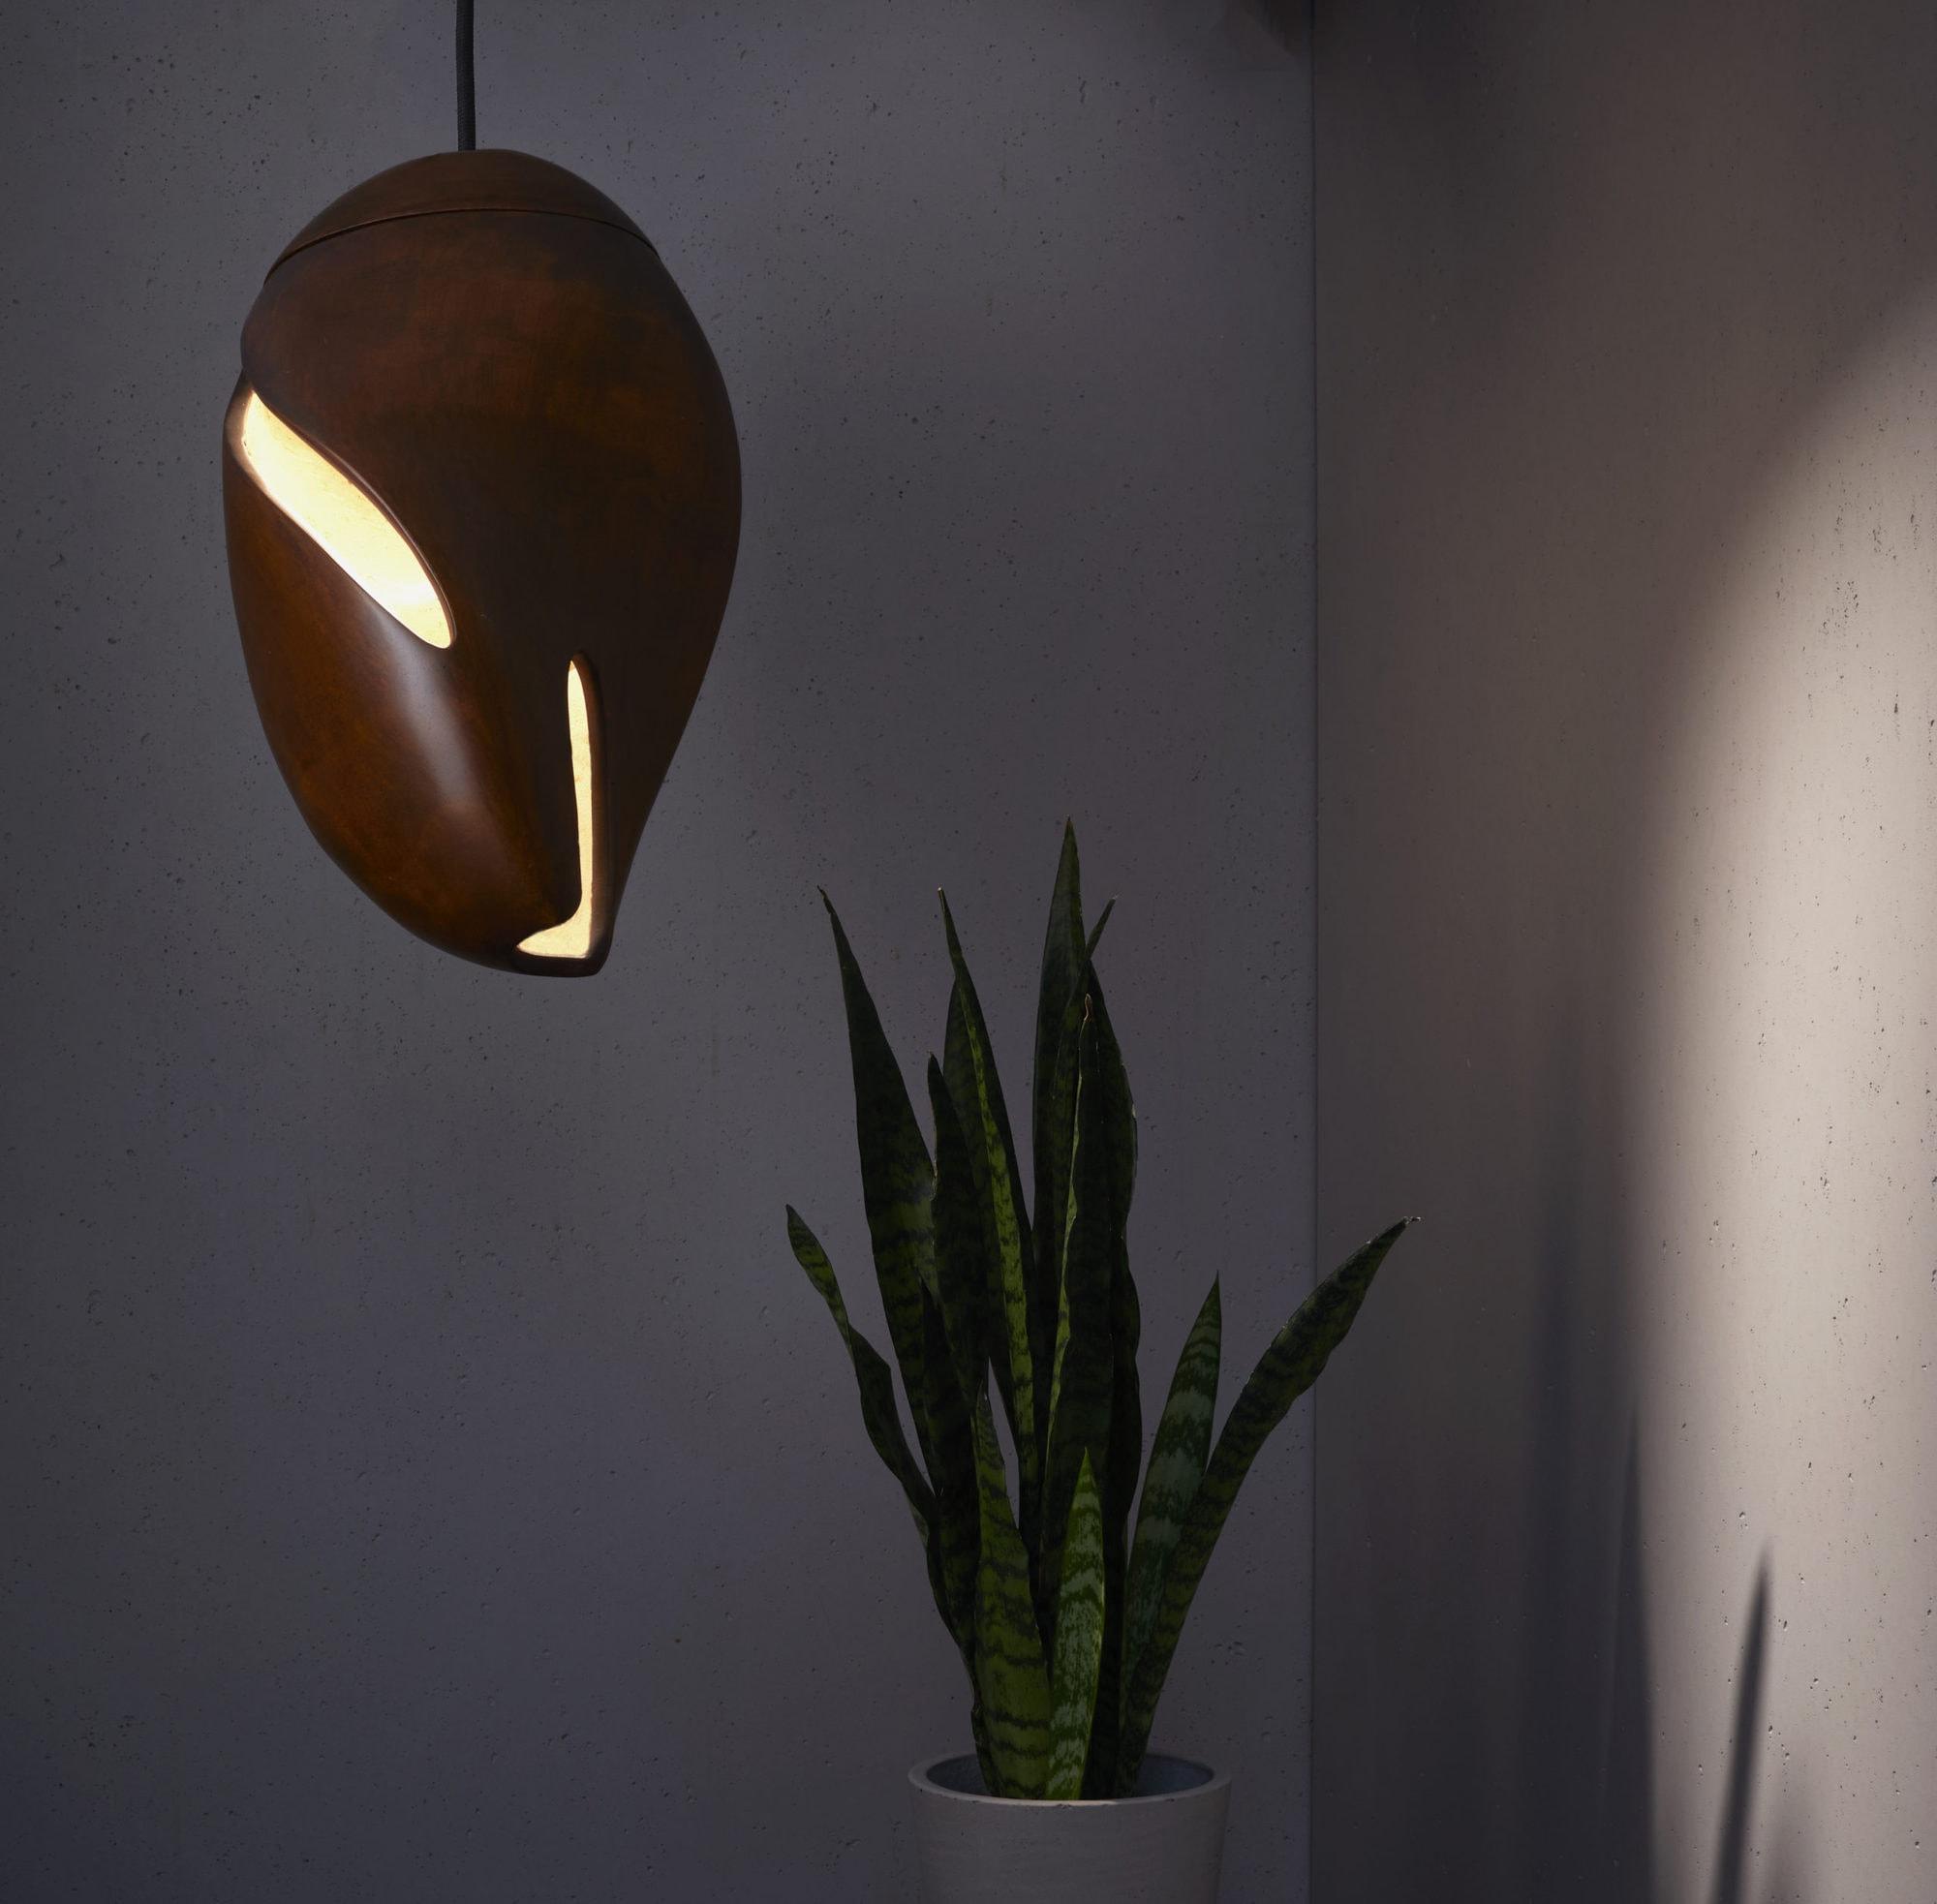 Cocoon OLED Fixture